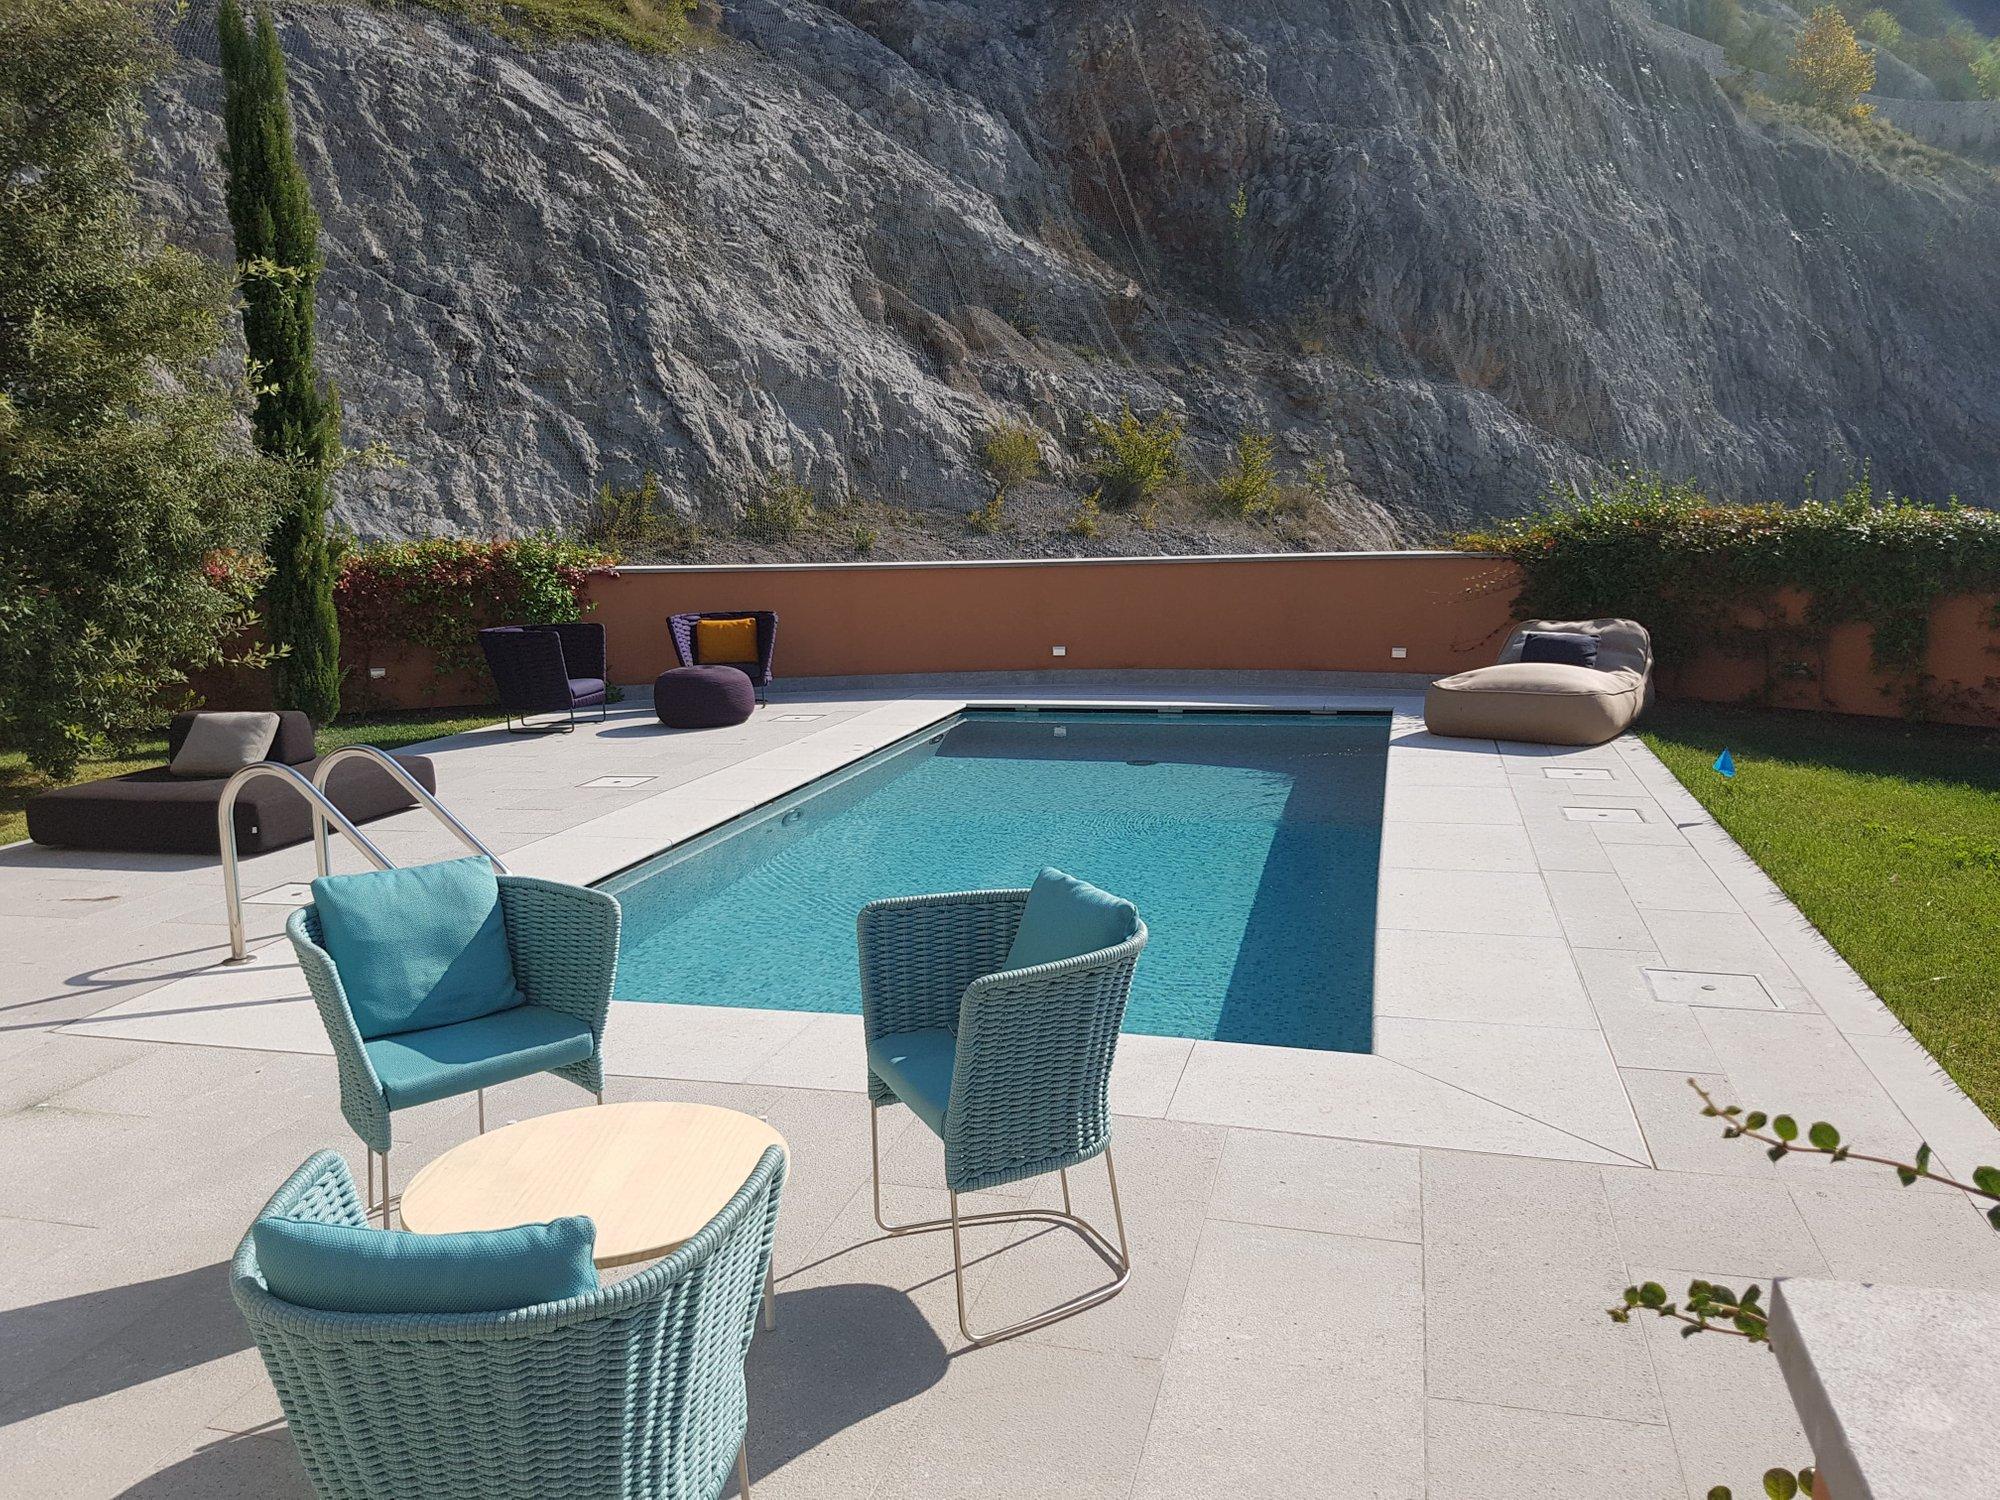 Apartment in Sistiana, Friuli-Venezia Giulia, Italy 1